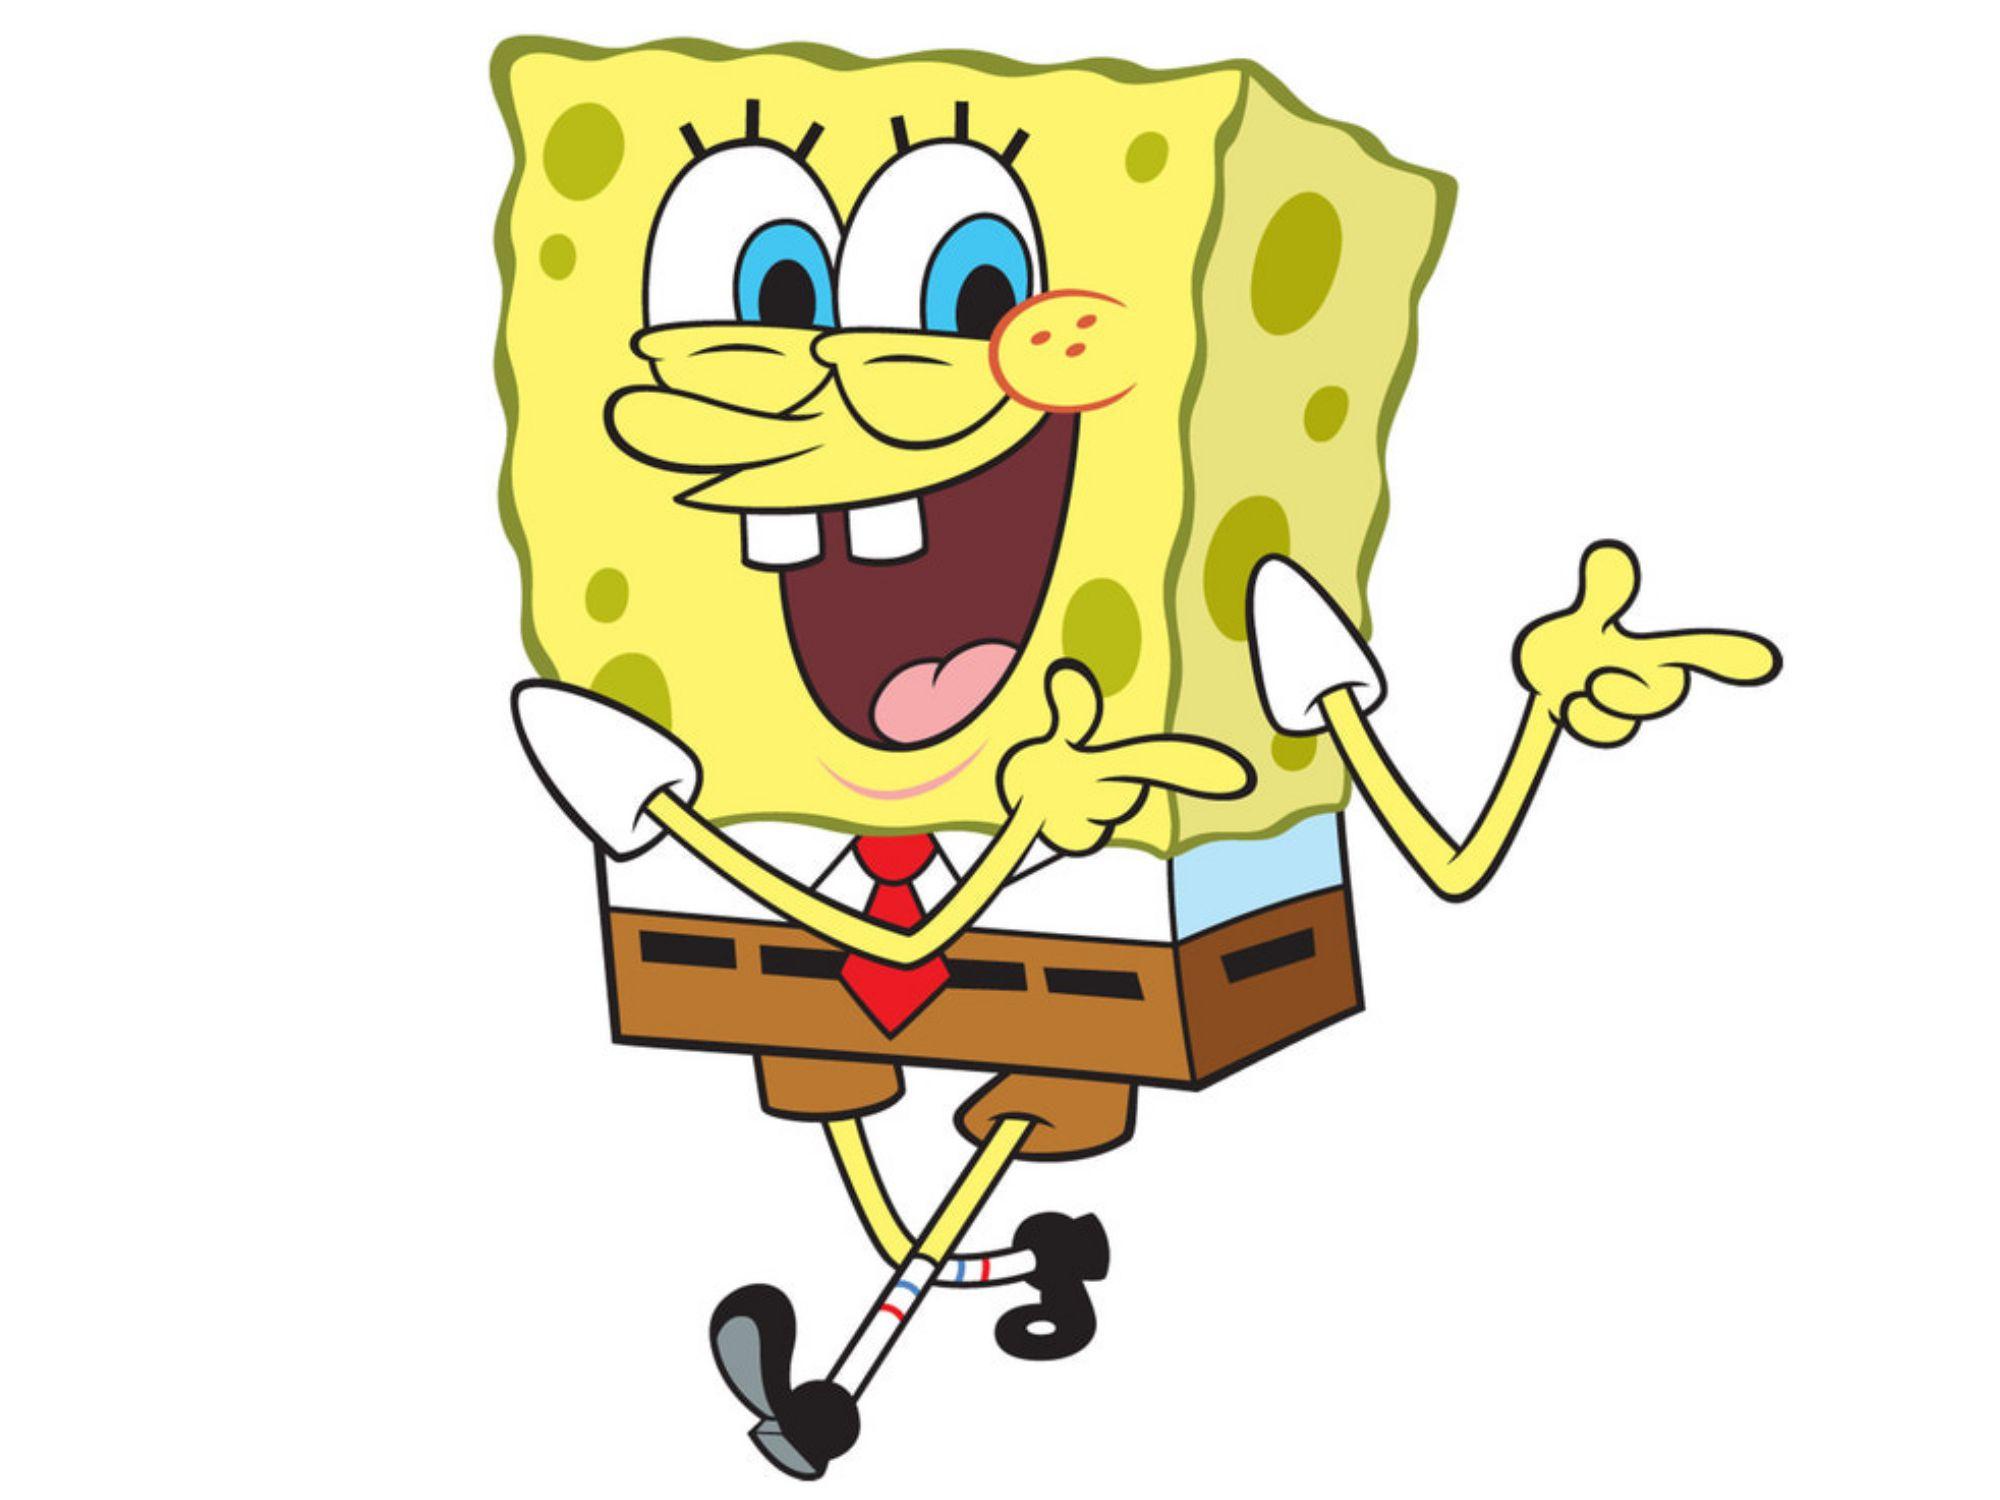 10 Best 'SpongeBob SquarePants' Episodes